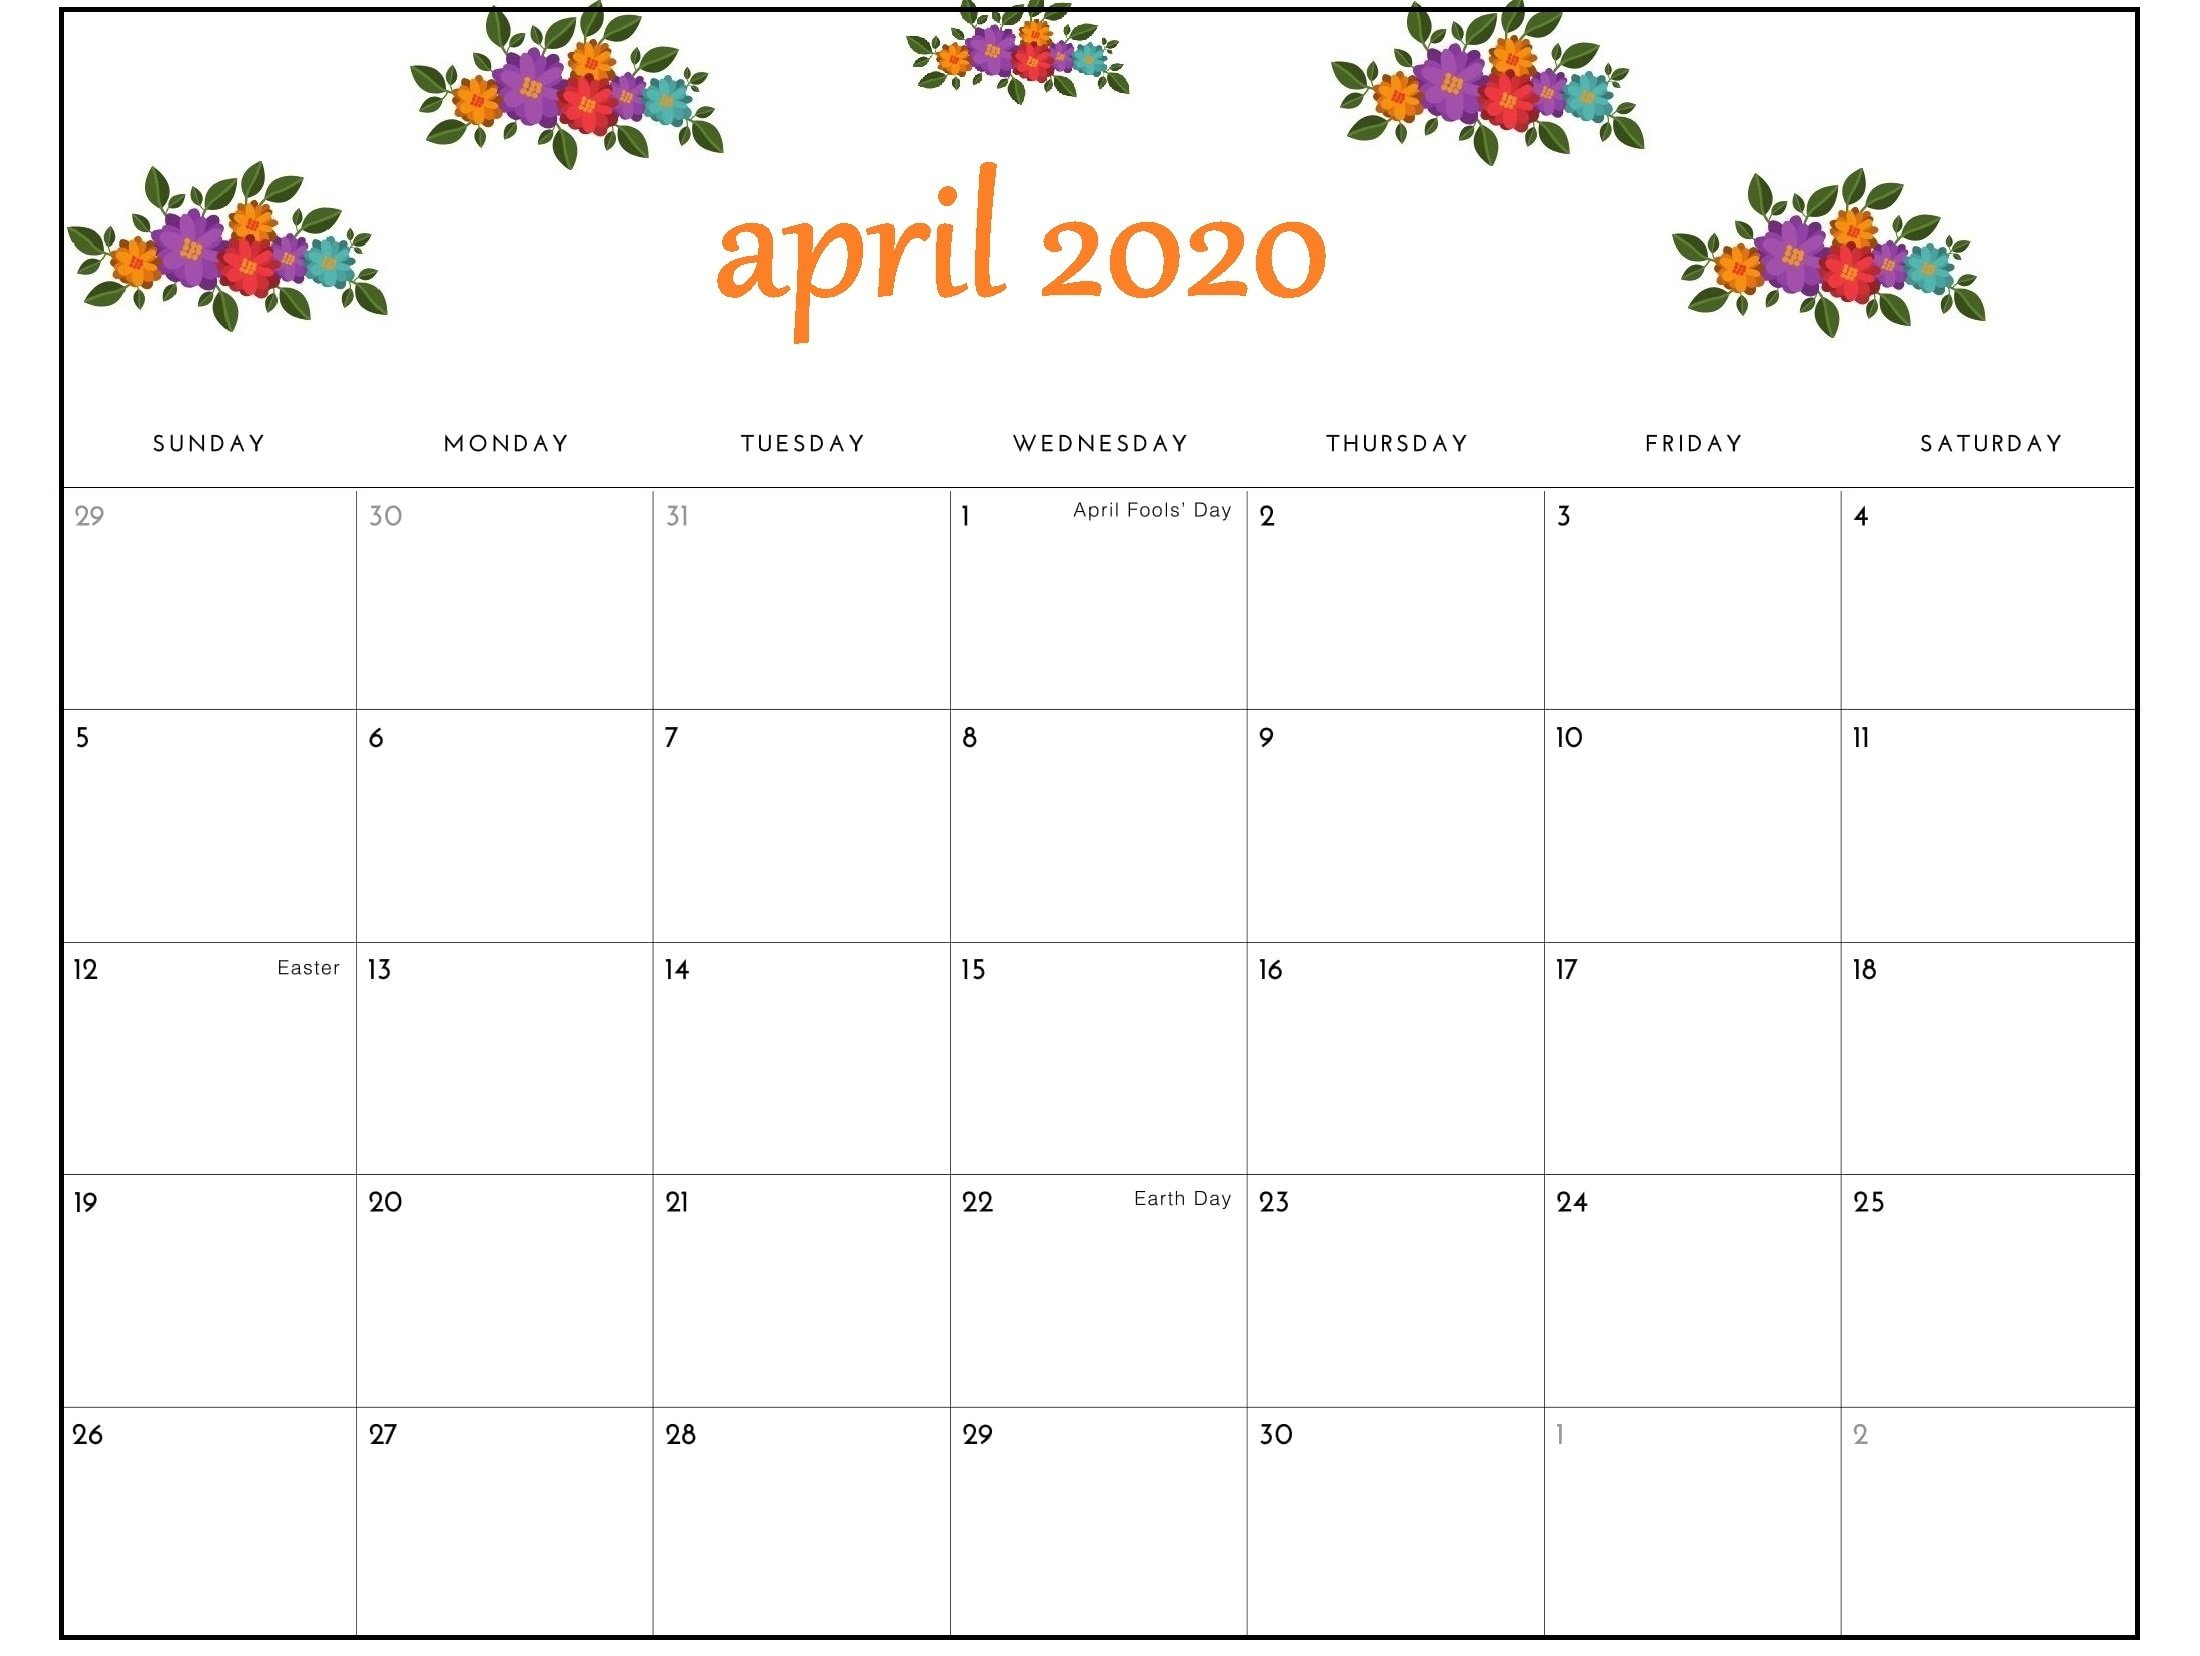 April 2020 Calendar Pdf Sheet For Exam   Free Printable 8X5 Monthly Calendar Print Outs